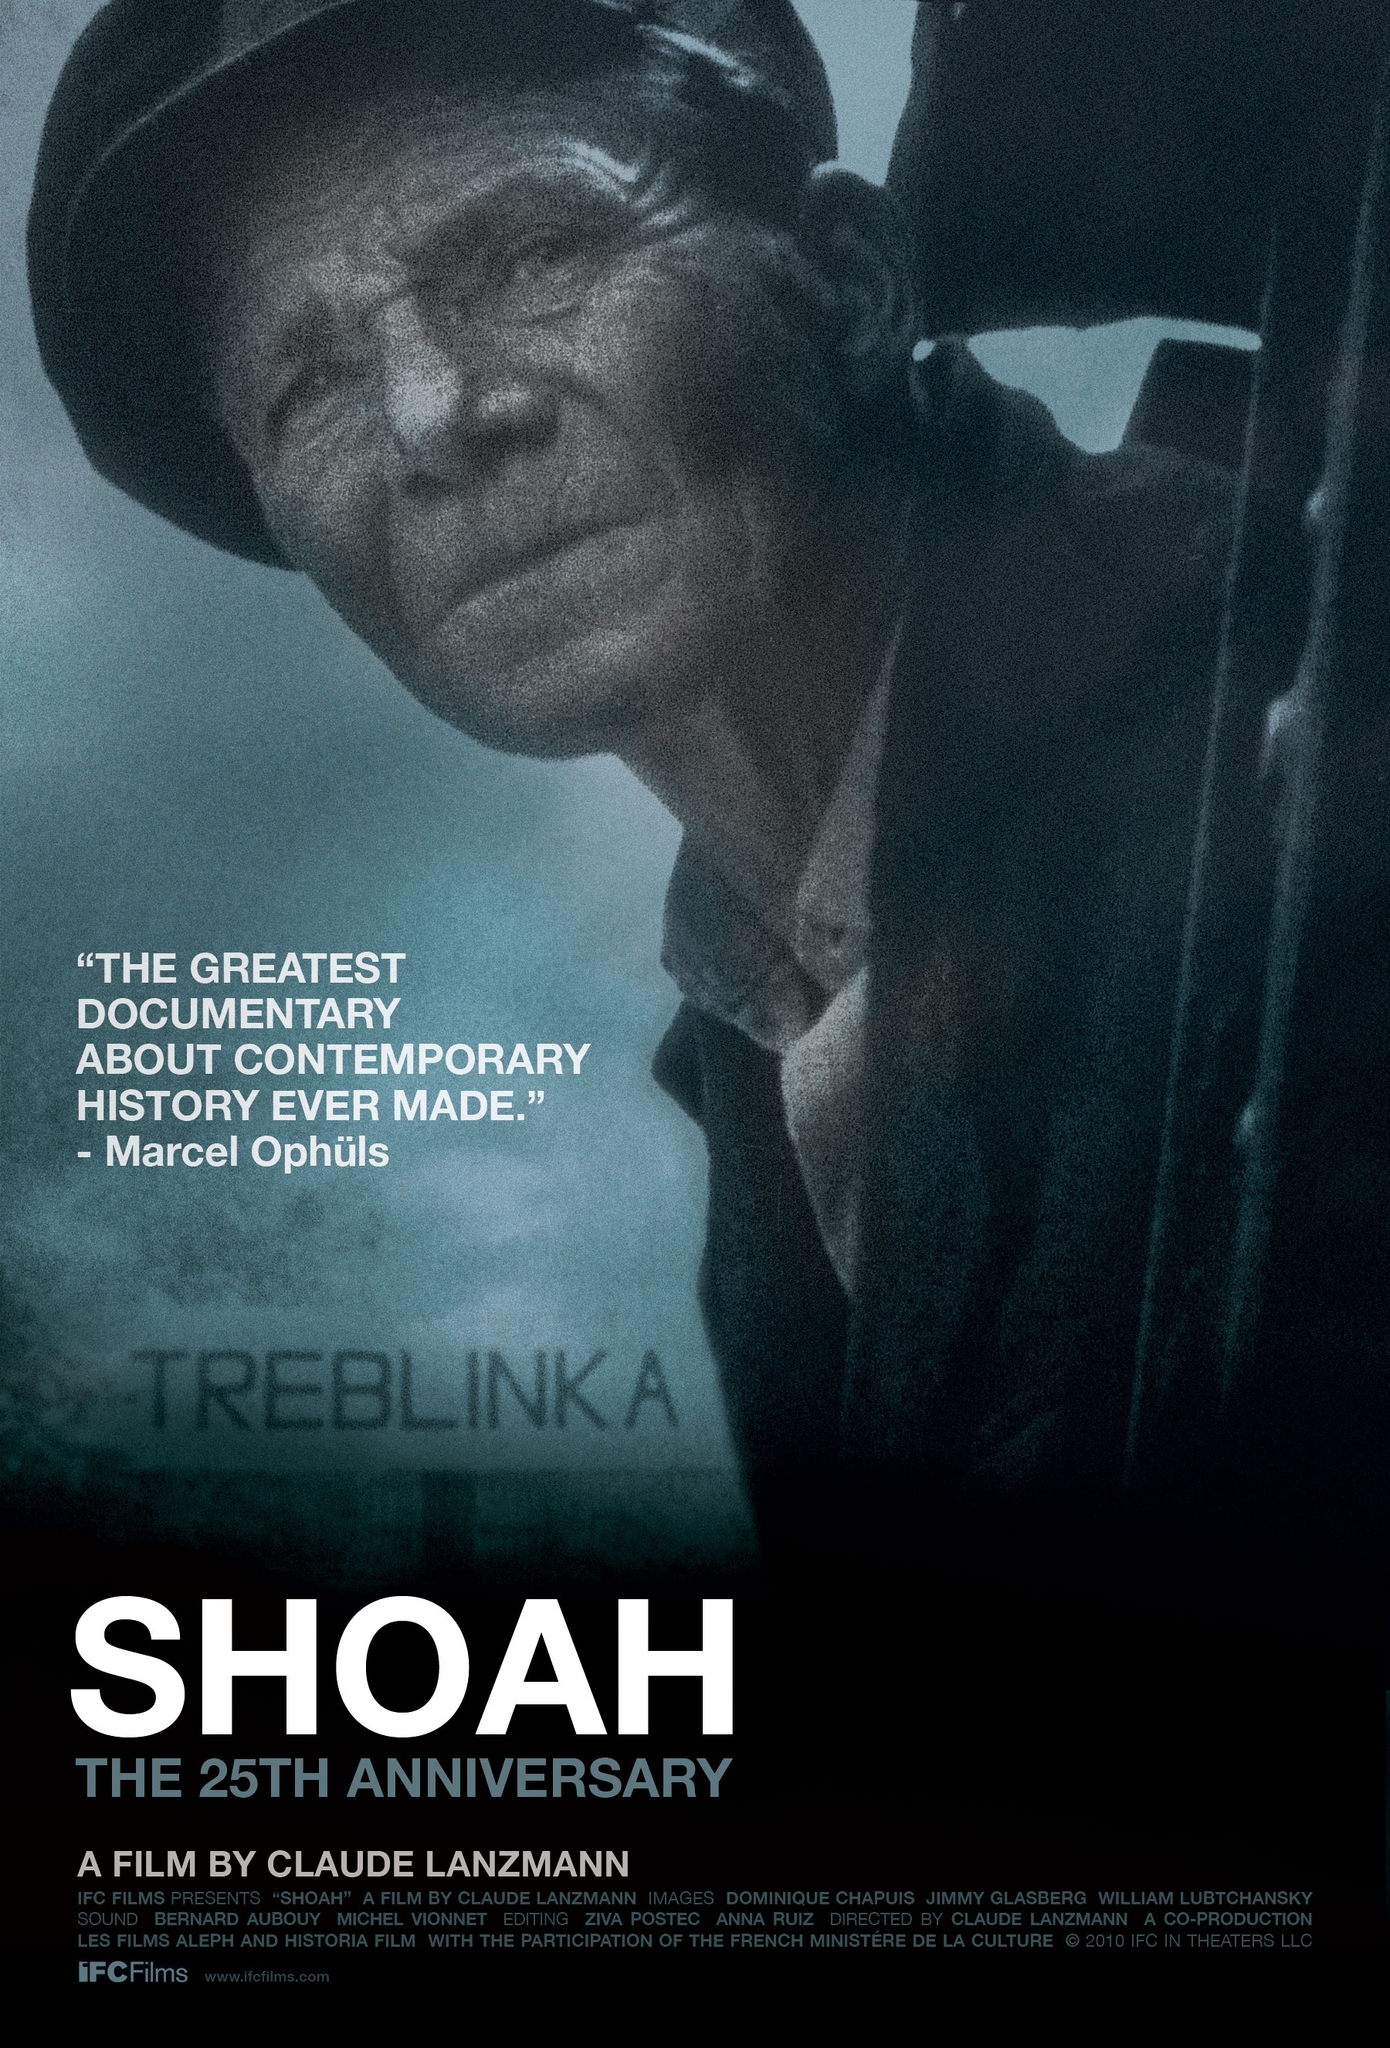 Shoah Film